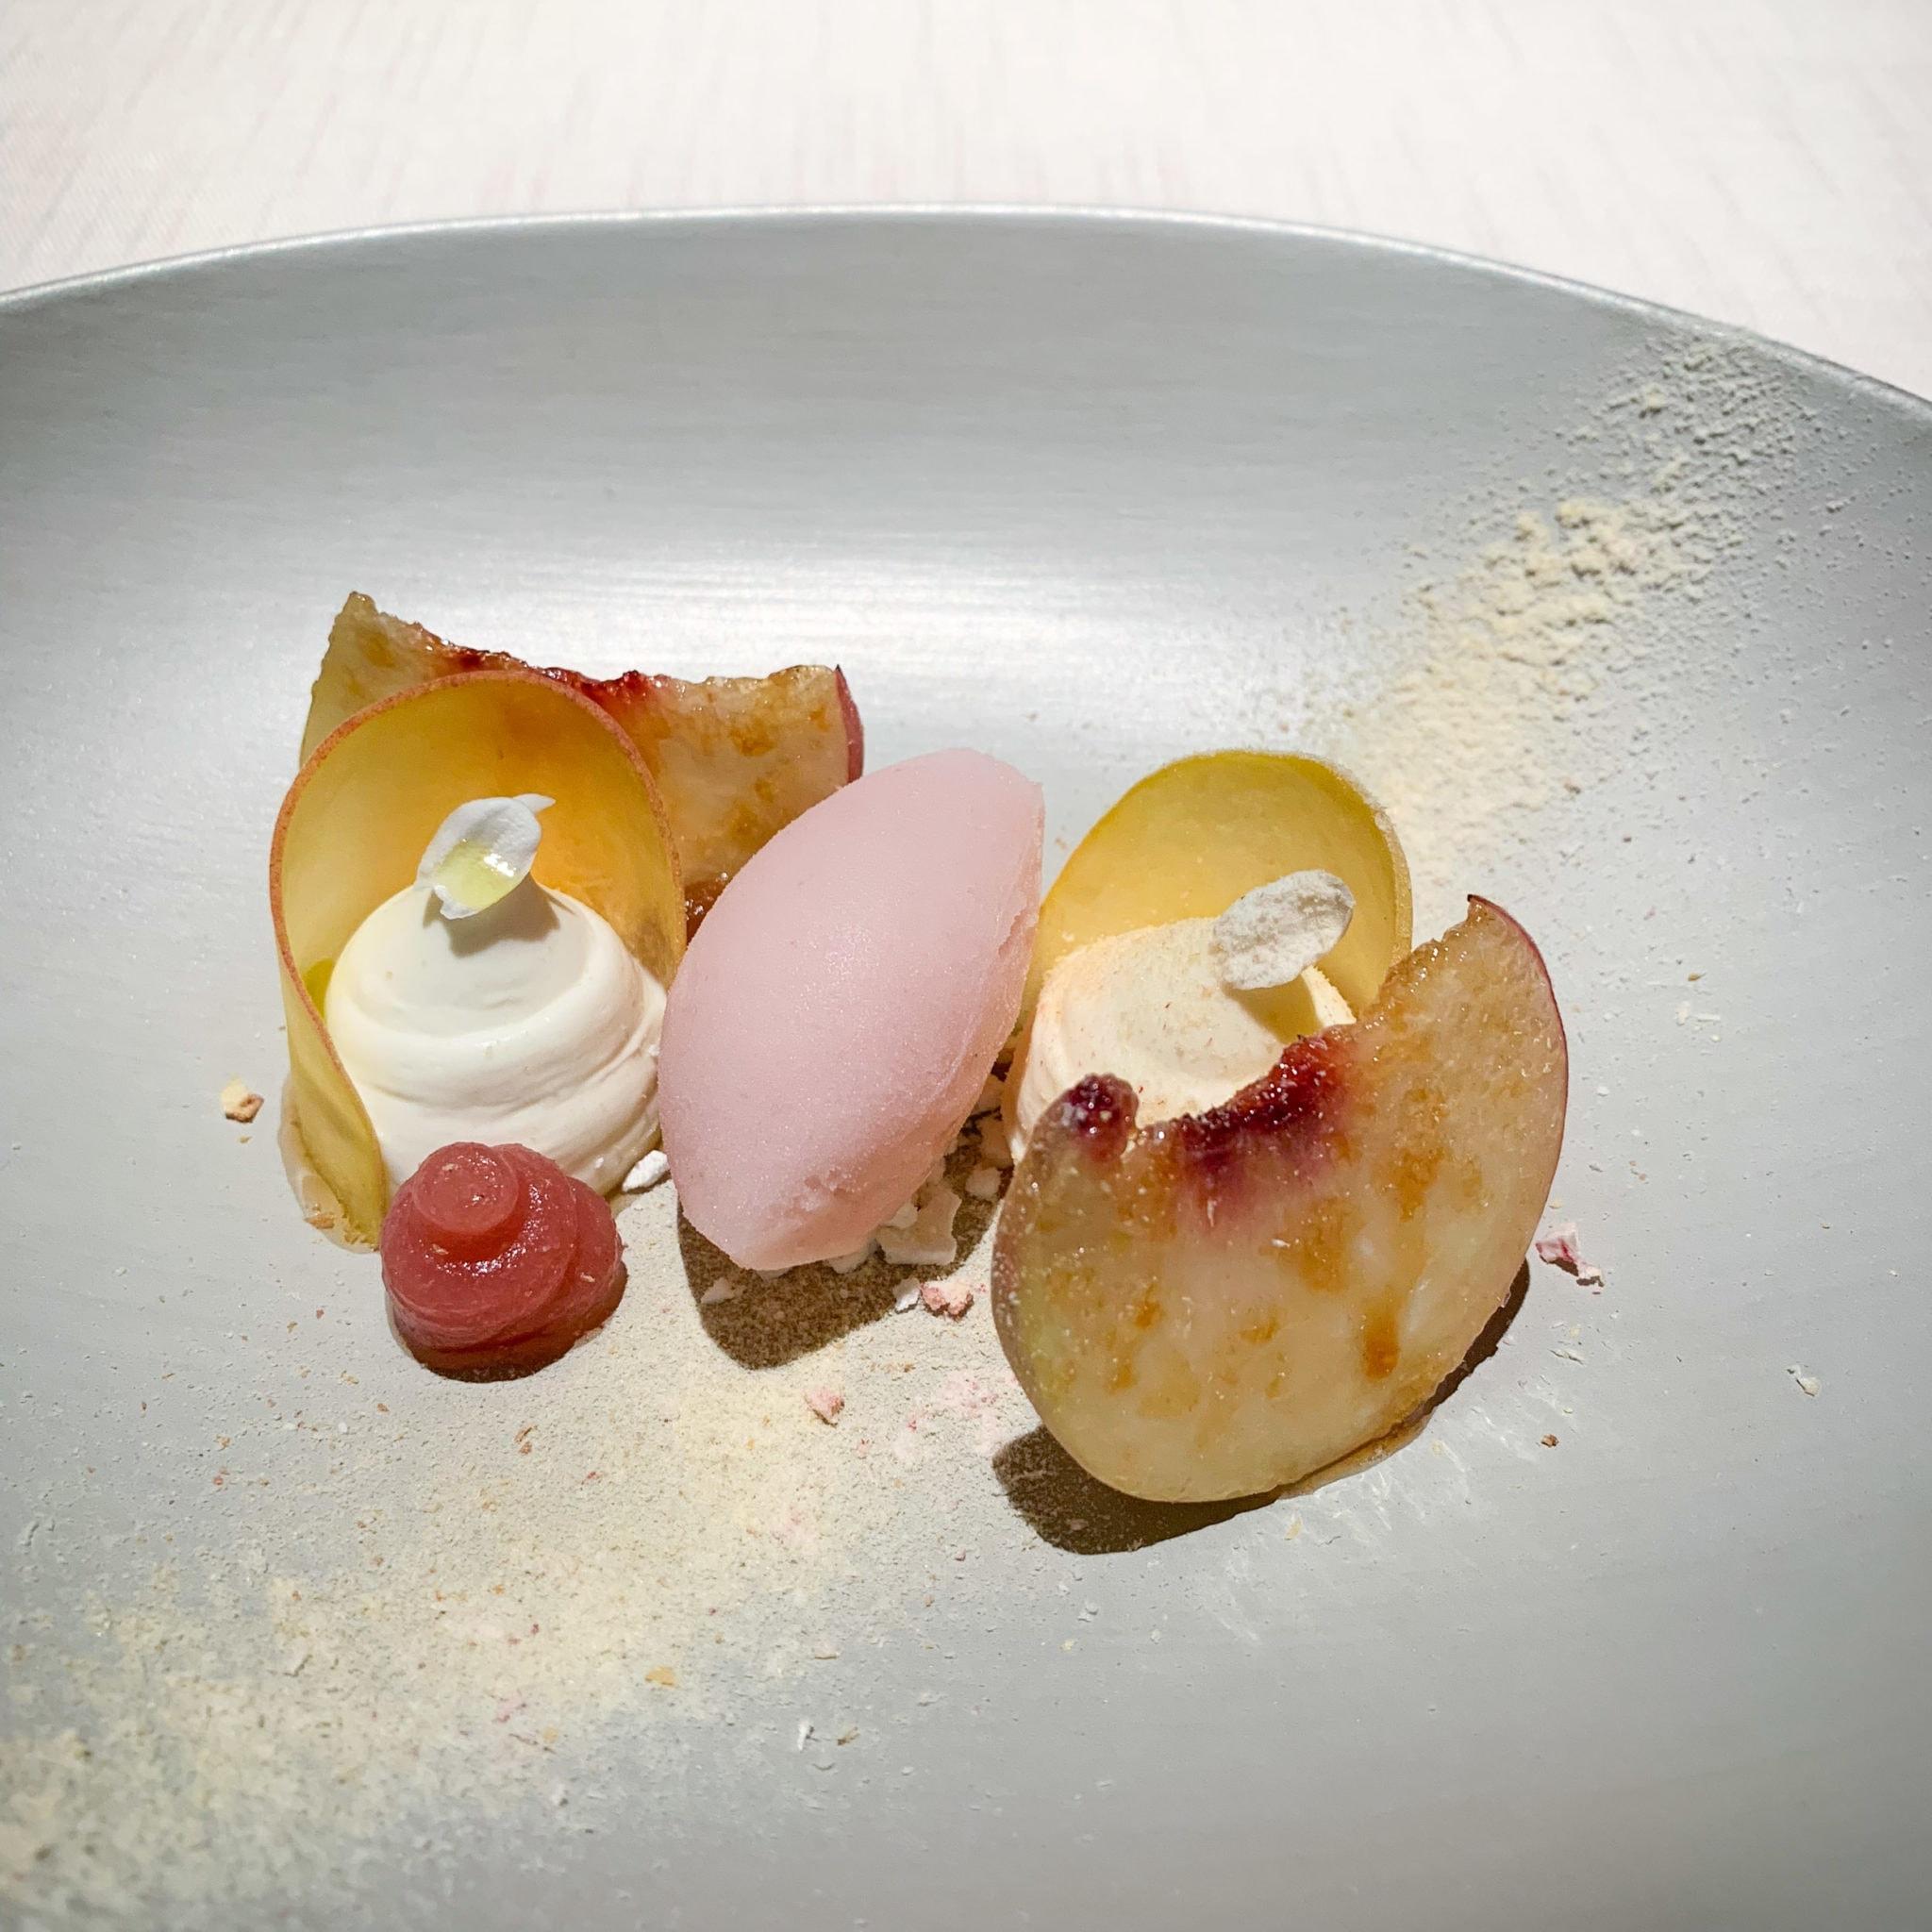 Peach and white chocolate dessert